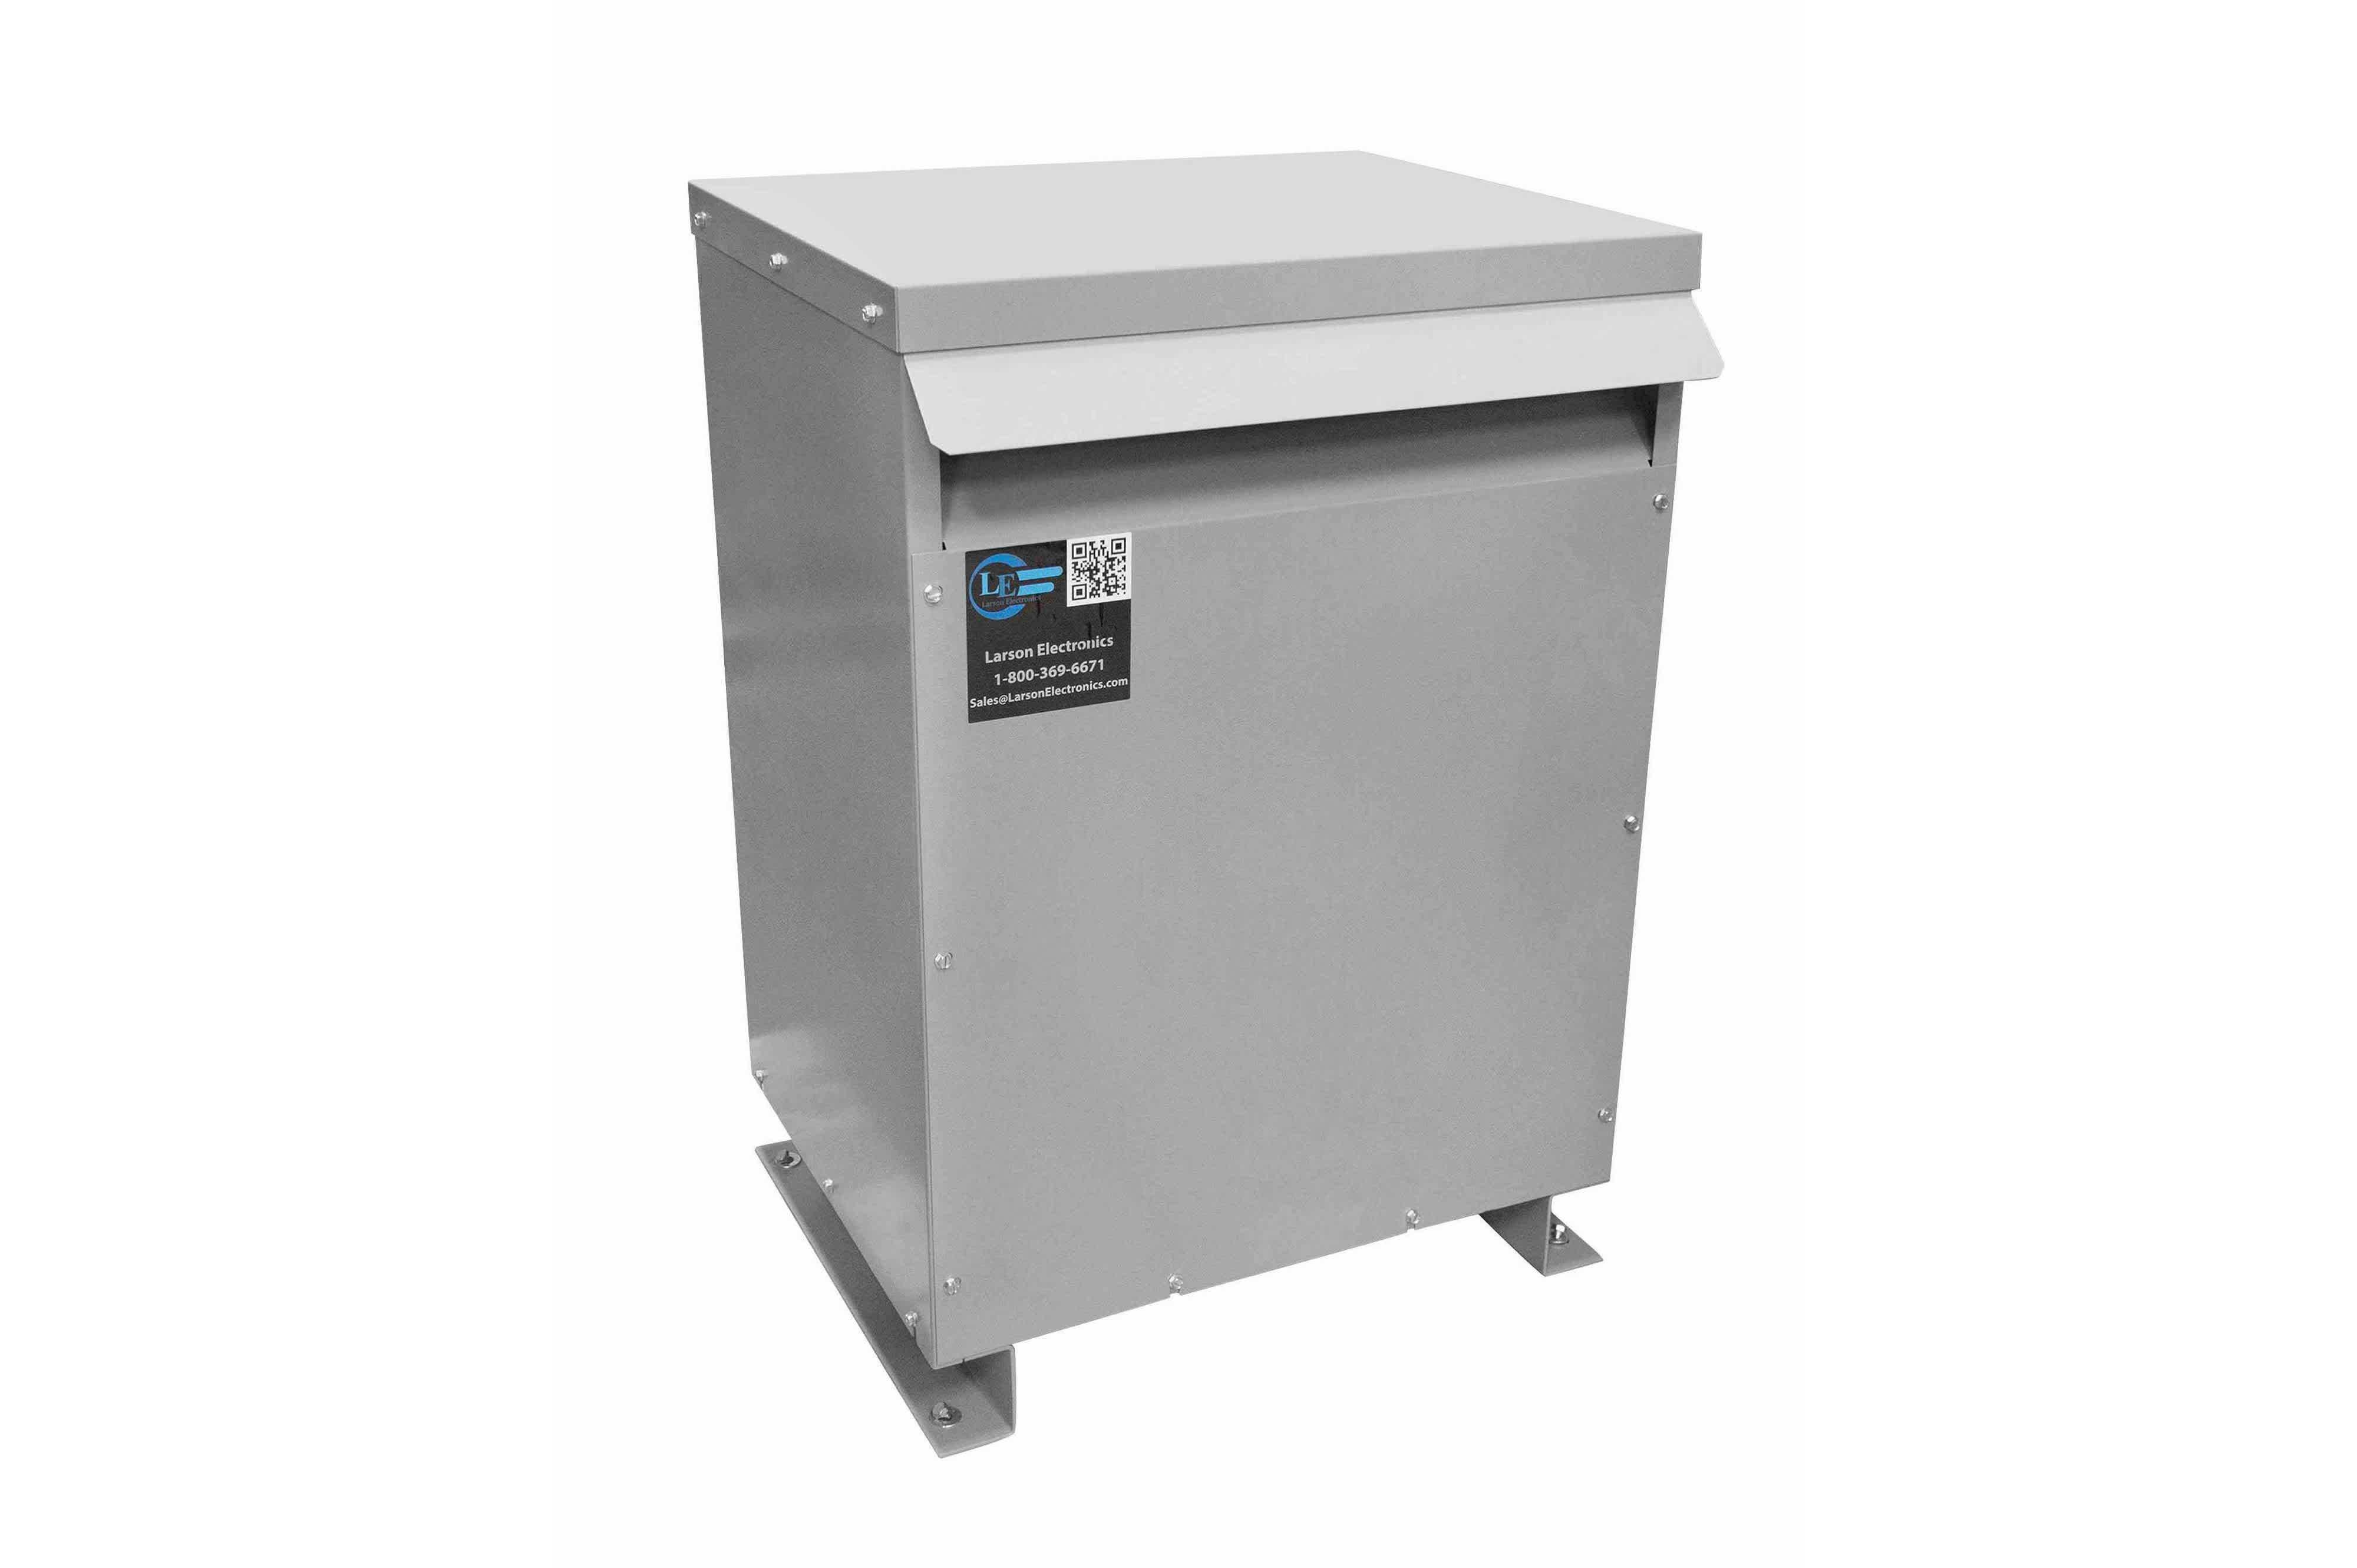 800 kVA 3PH Isolation Transformer, 460V Wye Primary, 240V/120 Delta Secondary, N3R, Ventilated, 60 Hz